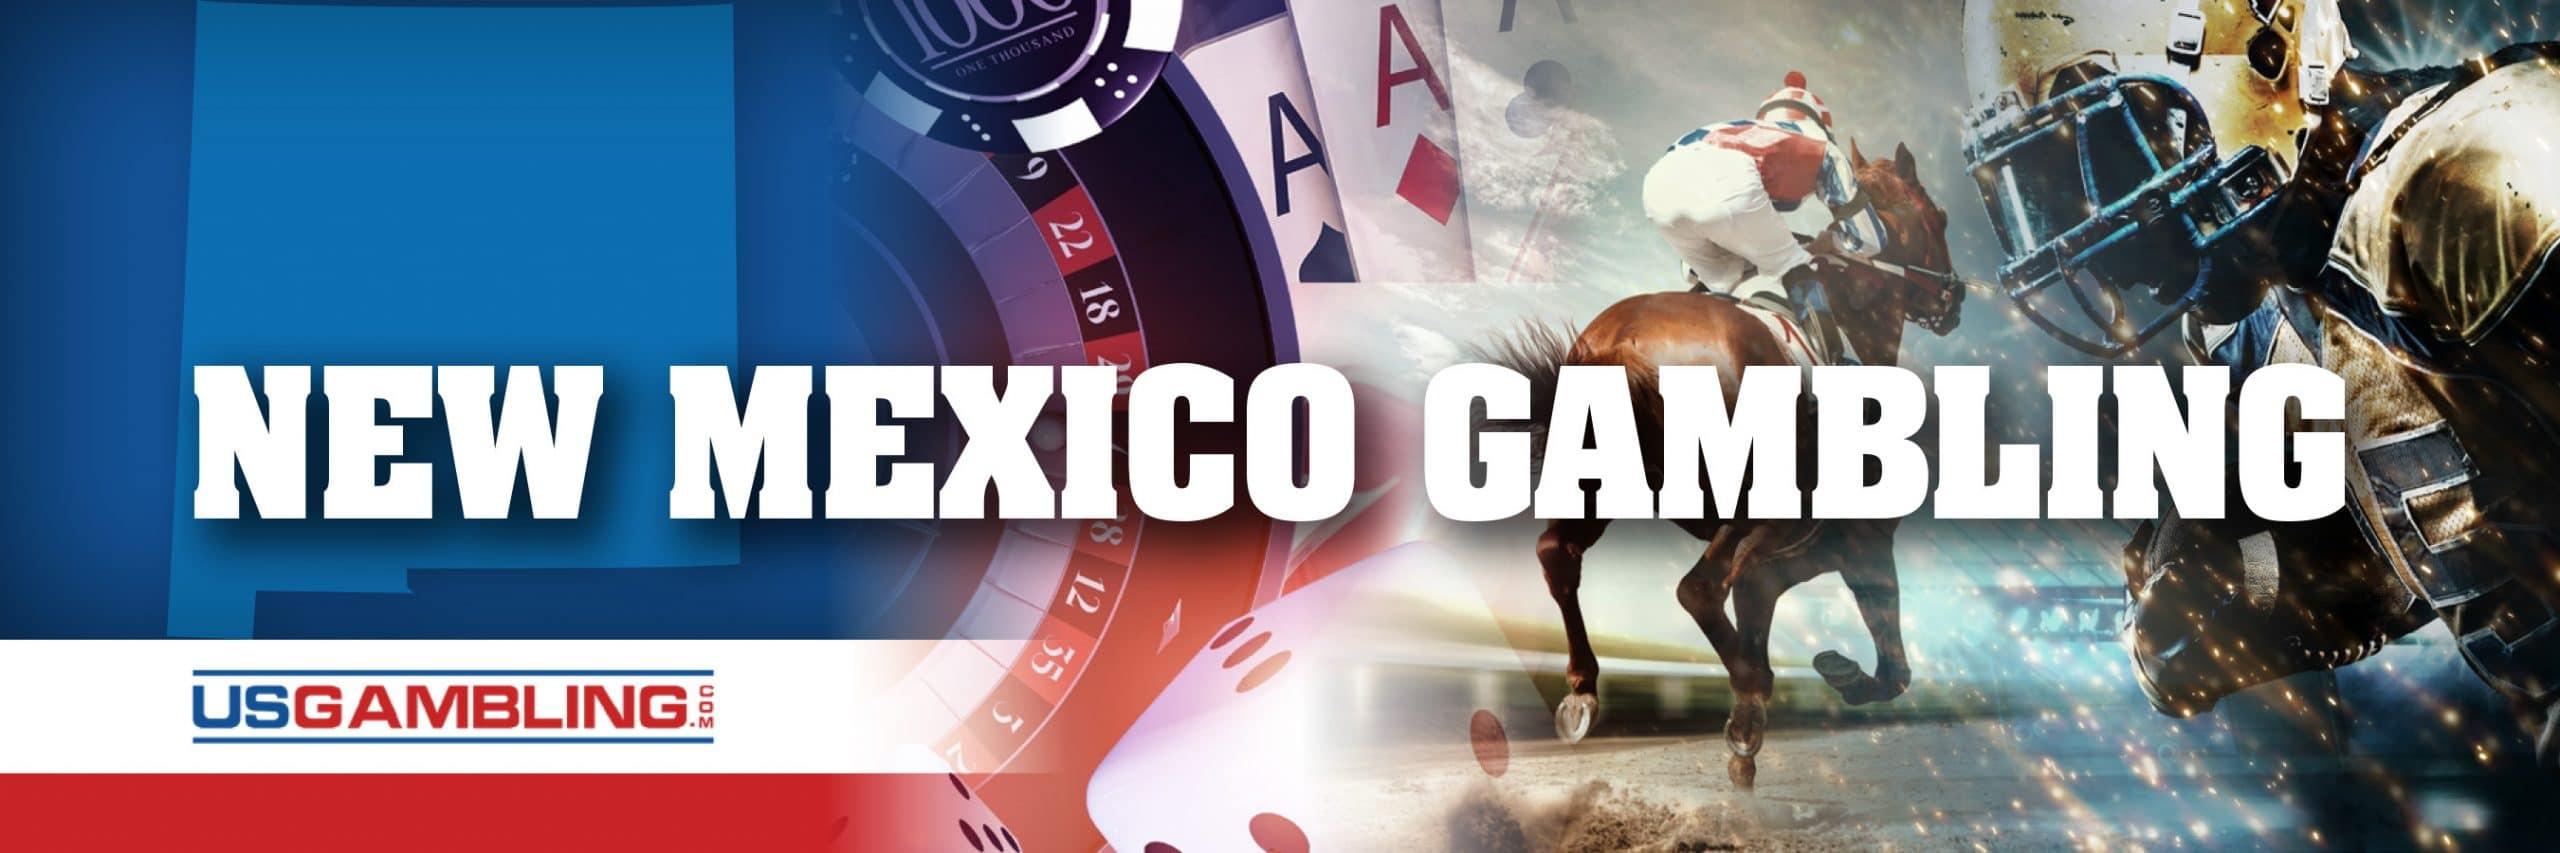 Legal New Mexico Gambling